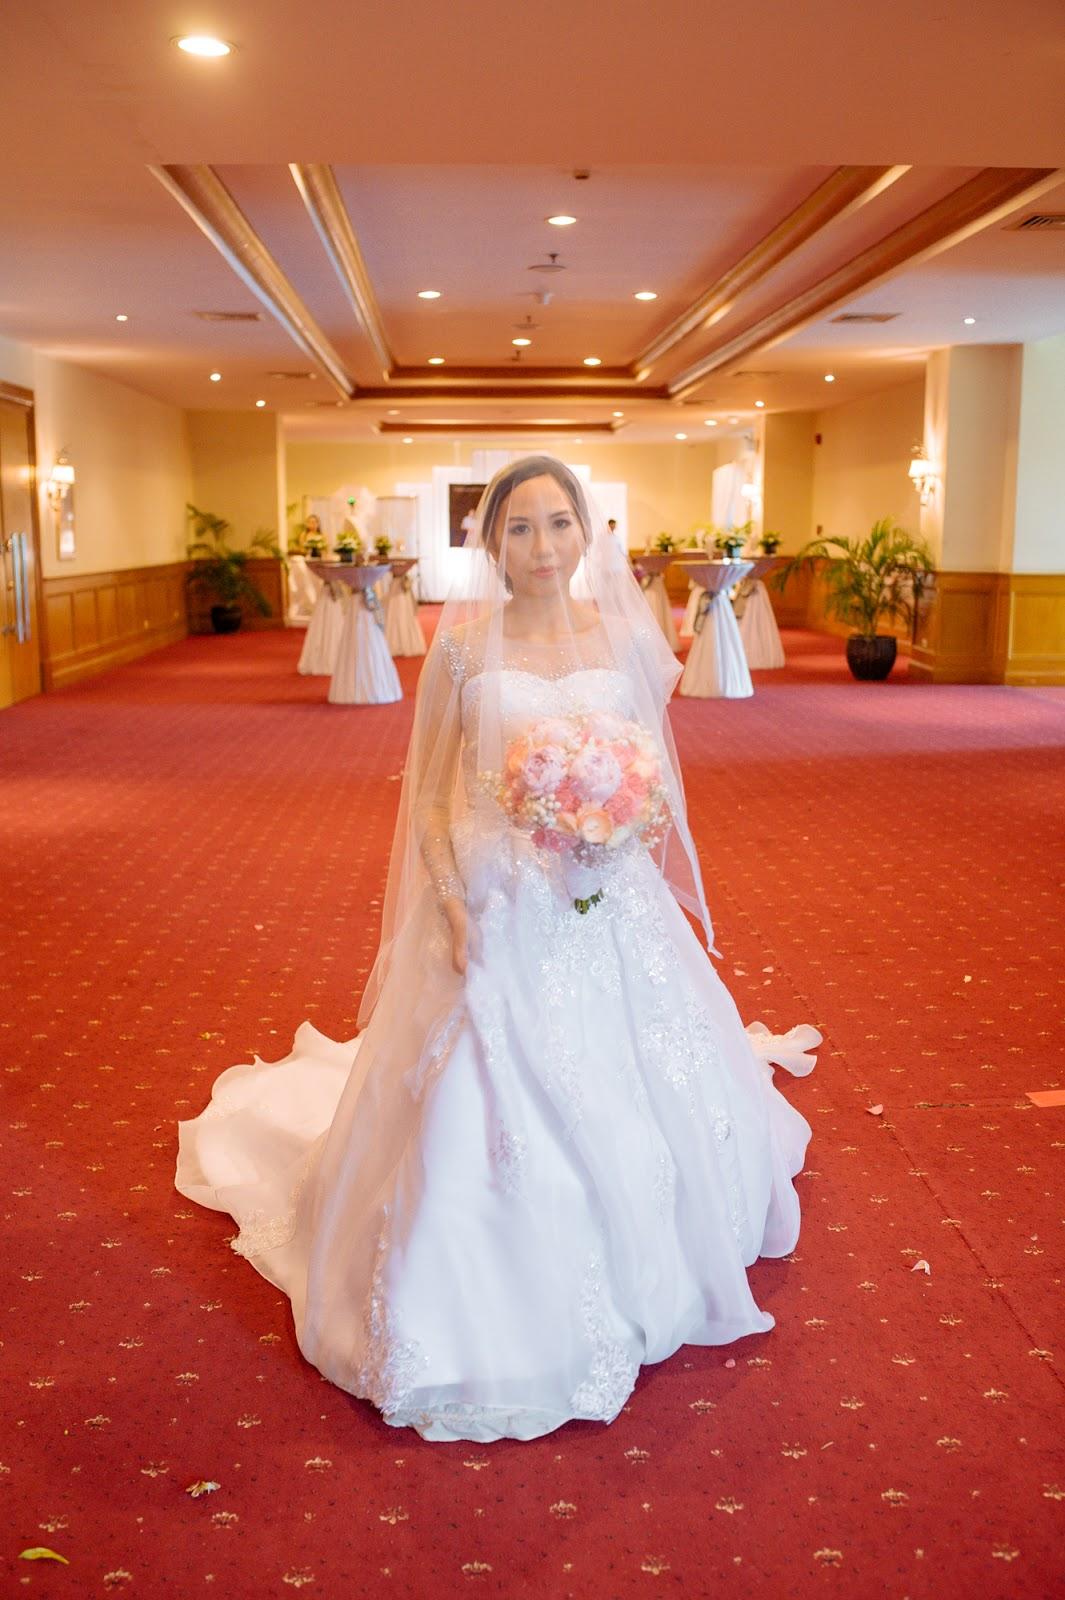 a ball gown wedding gown design